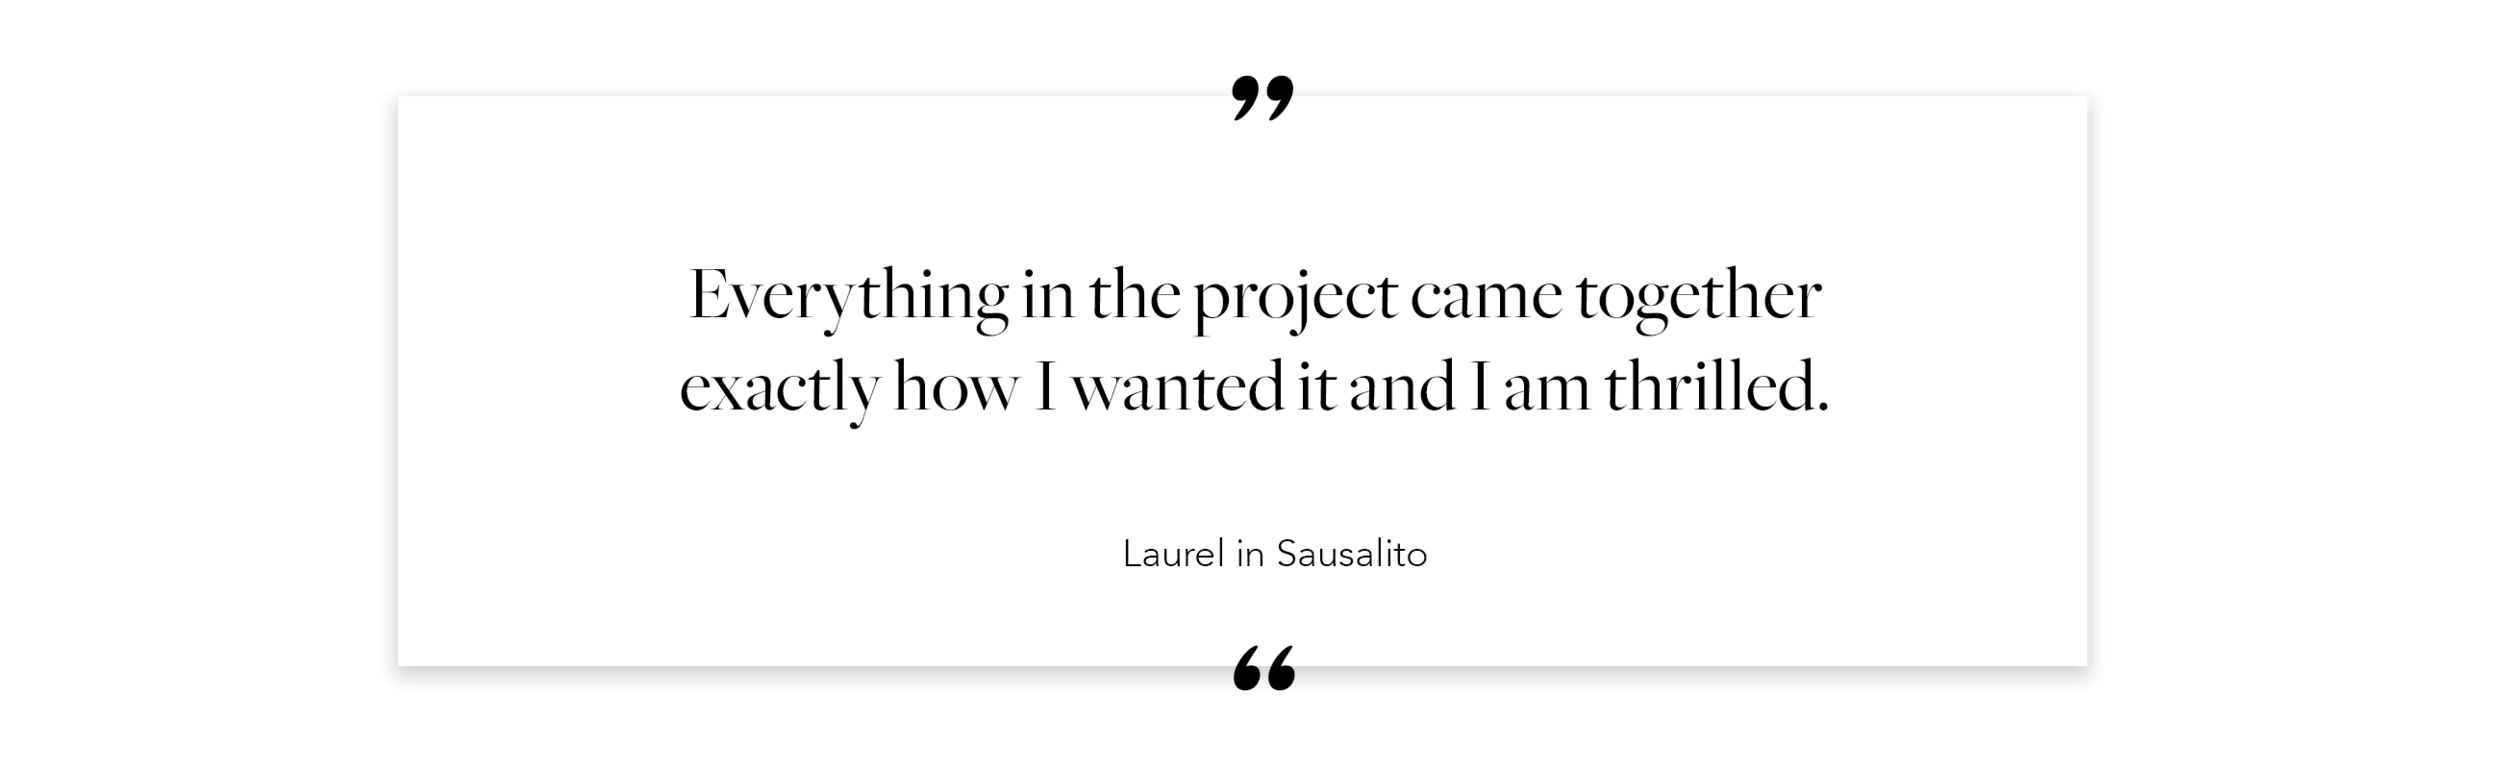 Customer-Quotes-Laurel.png